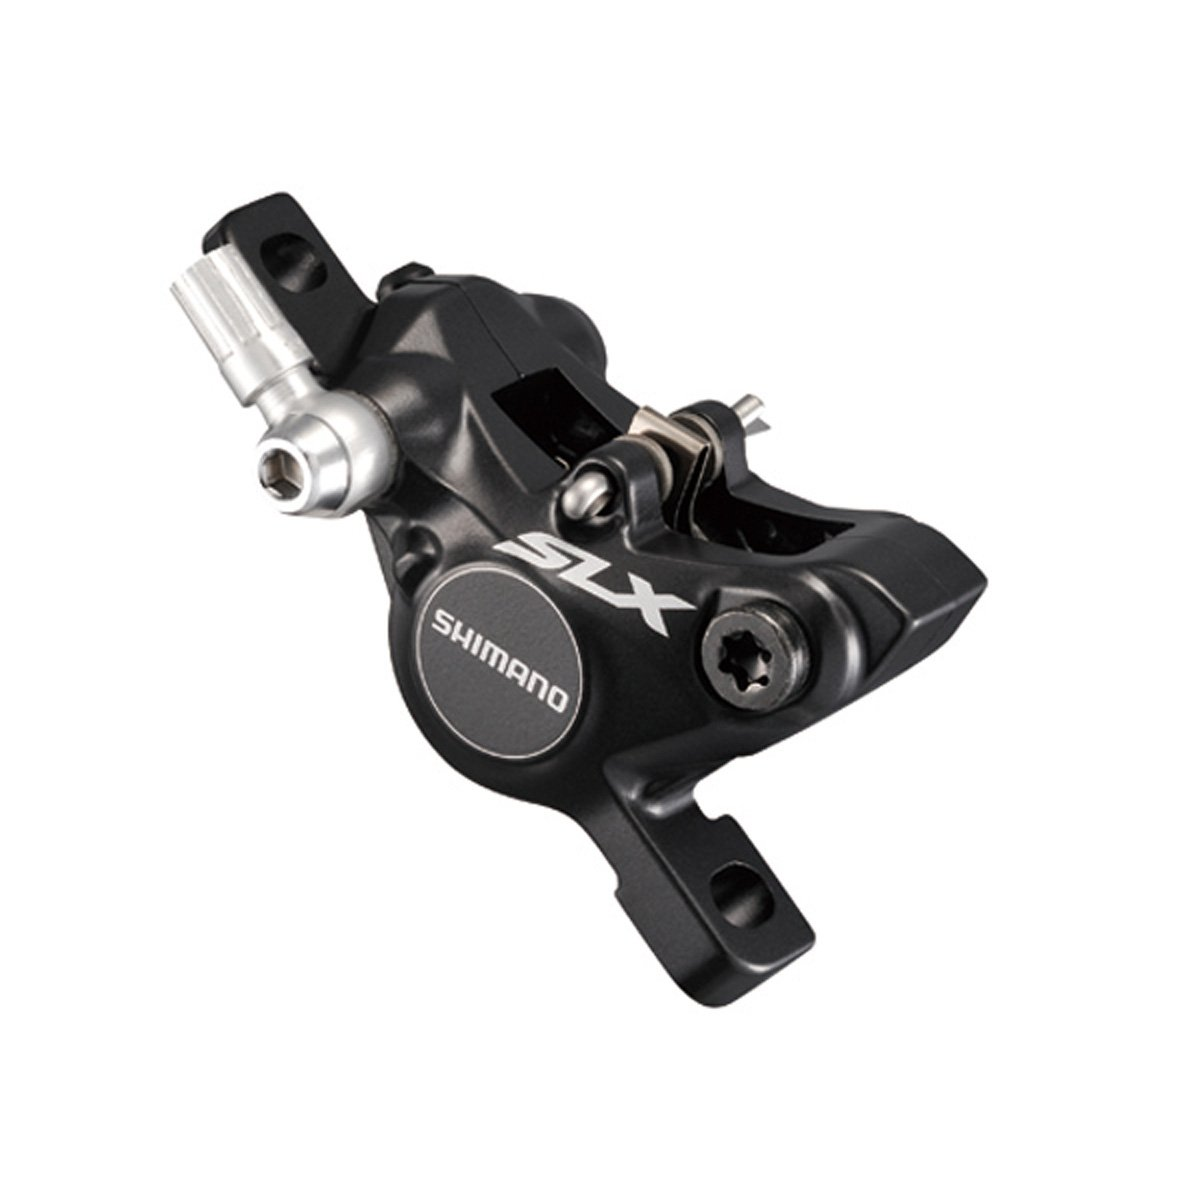 Shimano SLX BR-M675 - Frein àdisque 2014 frein vtt M675BLFPNA100